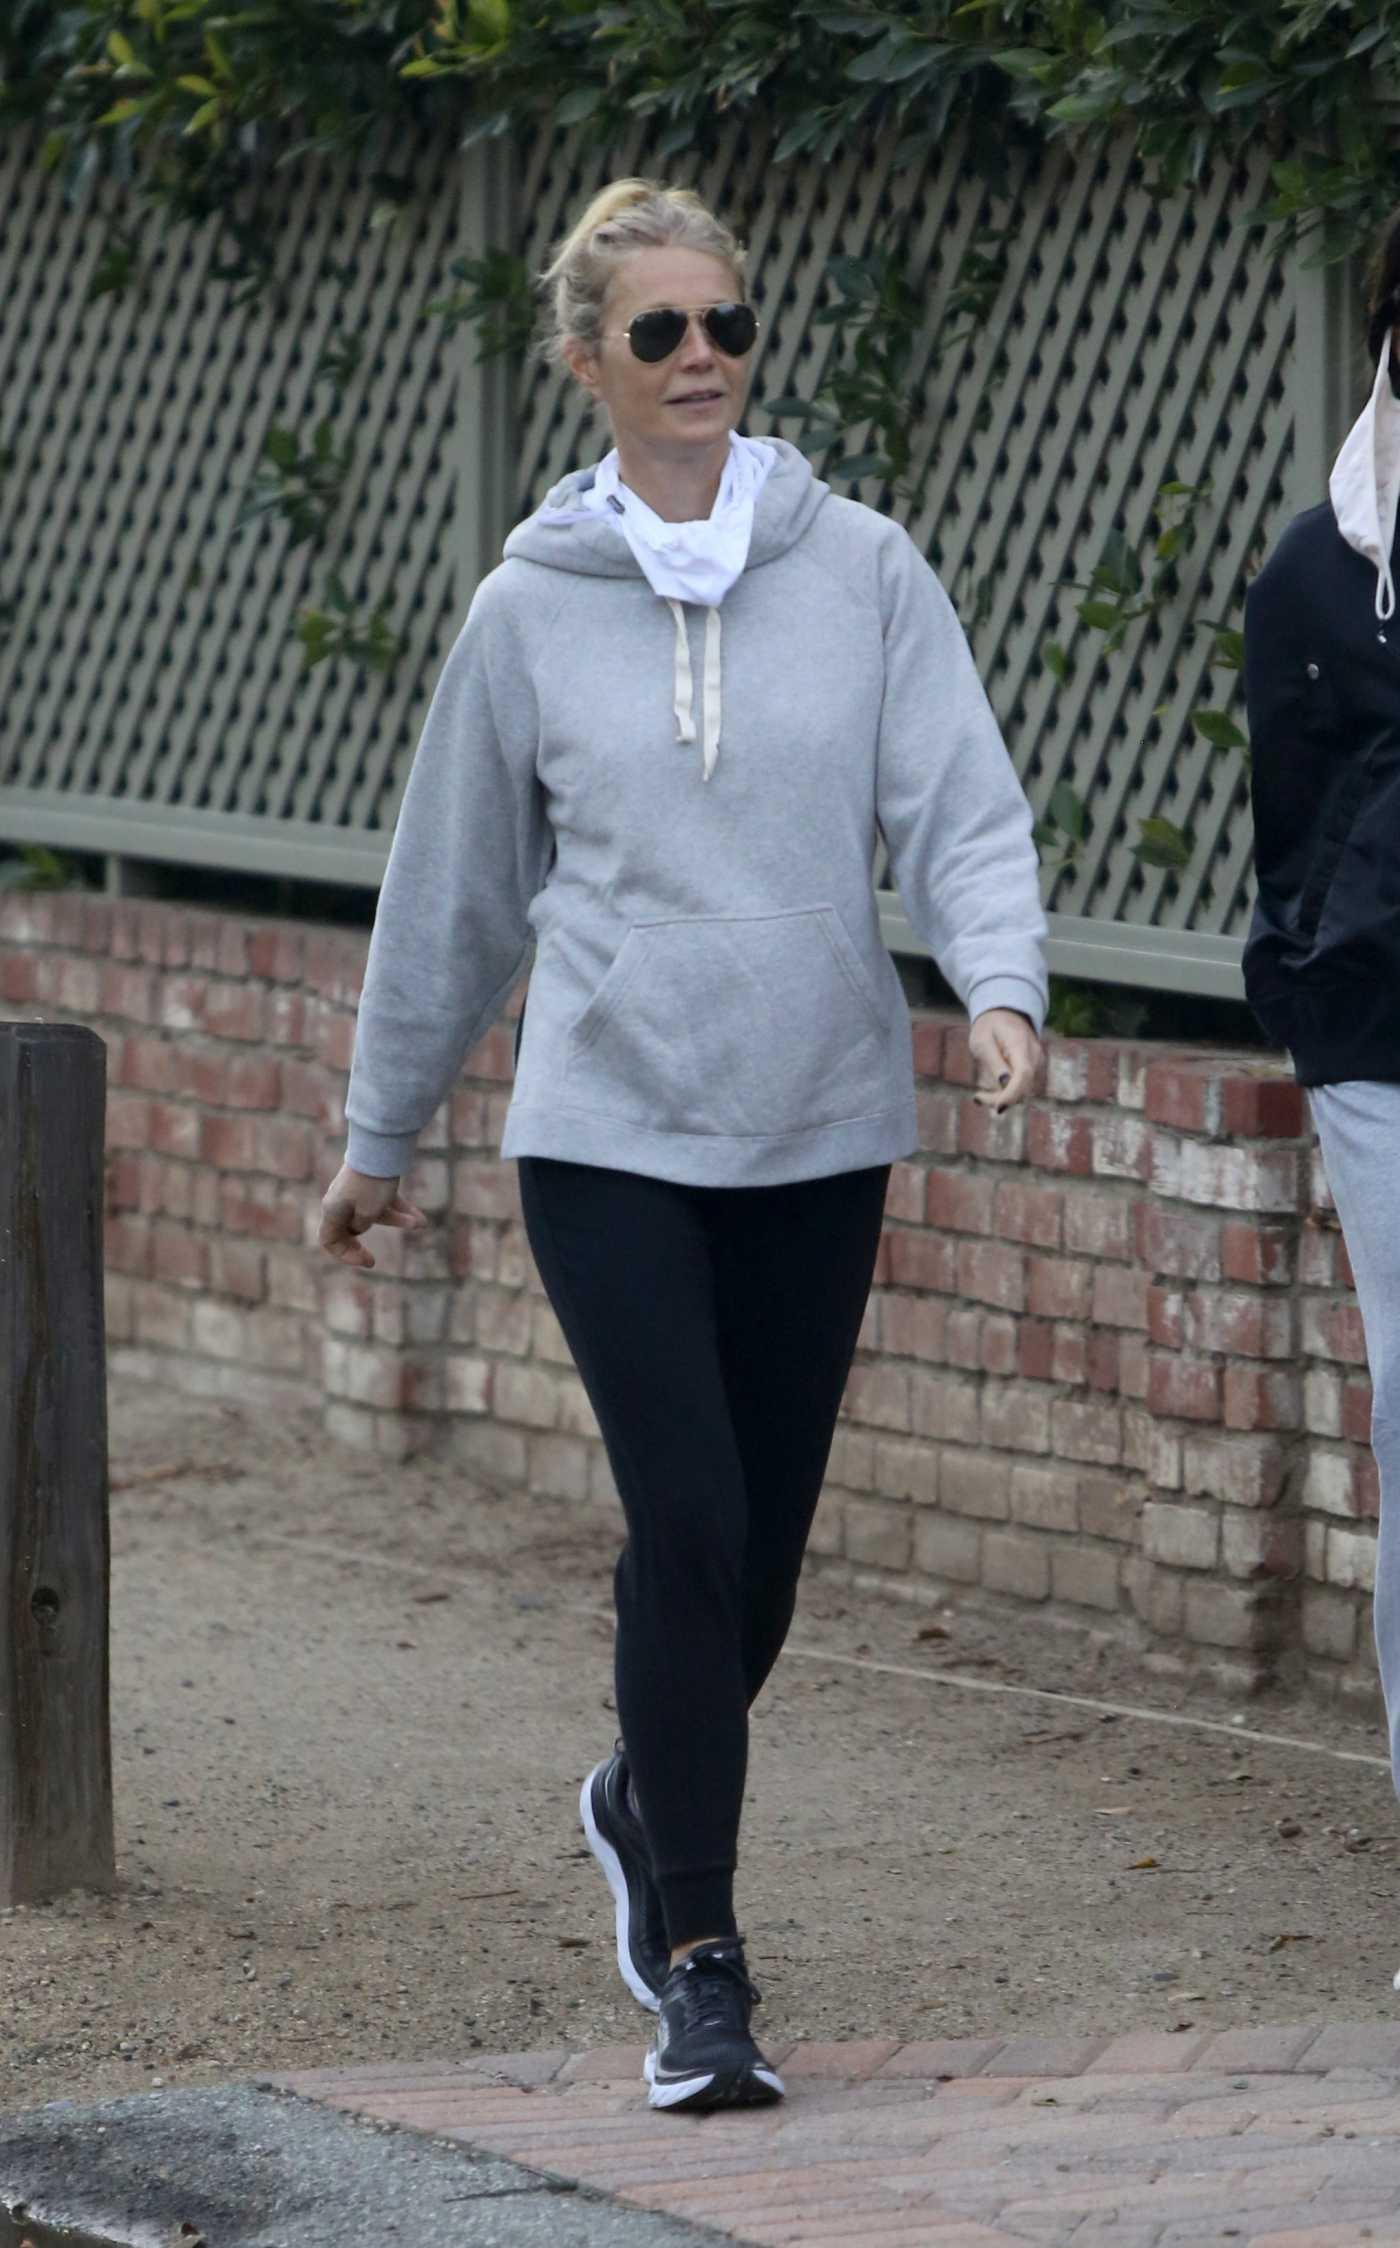 Gwyneth Paltrow in a Grey Hoodie Takes a Walk with a Friend in Brentwood 02/02/2021